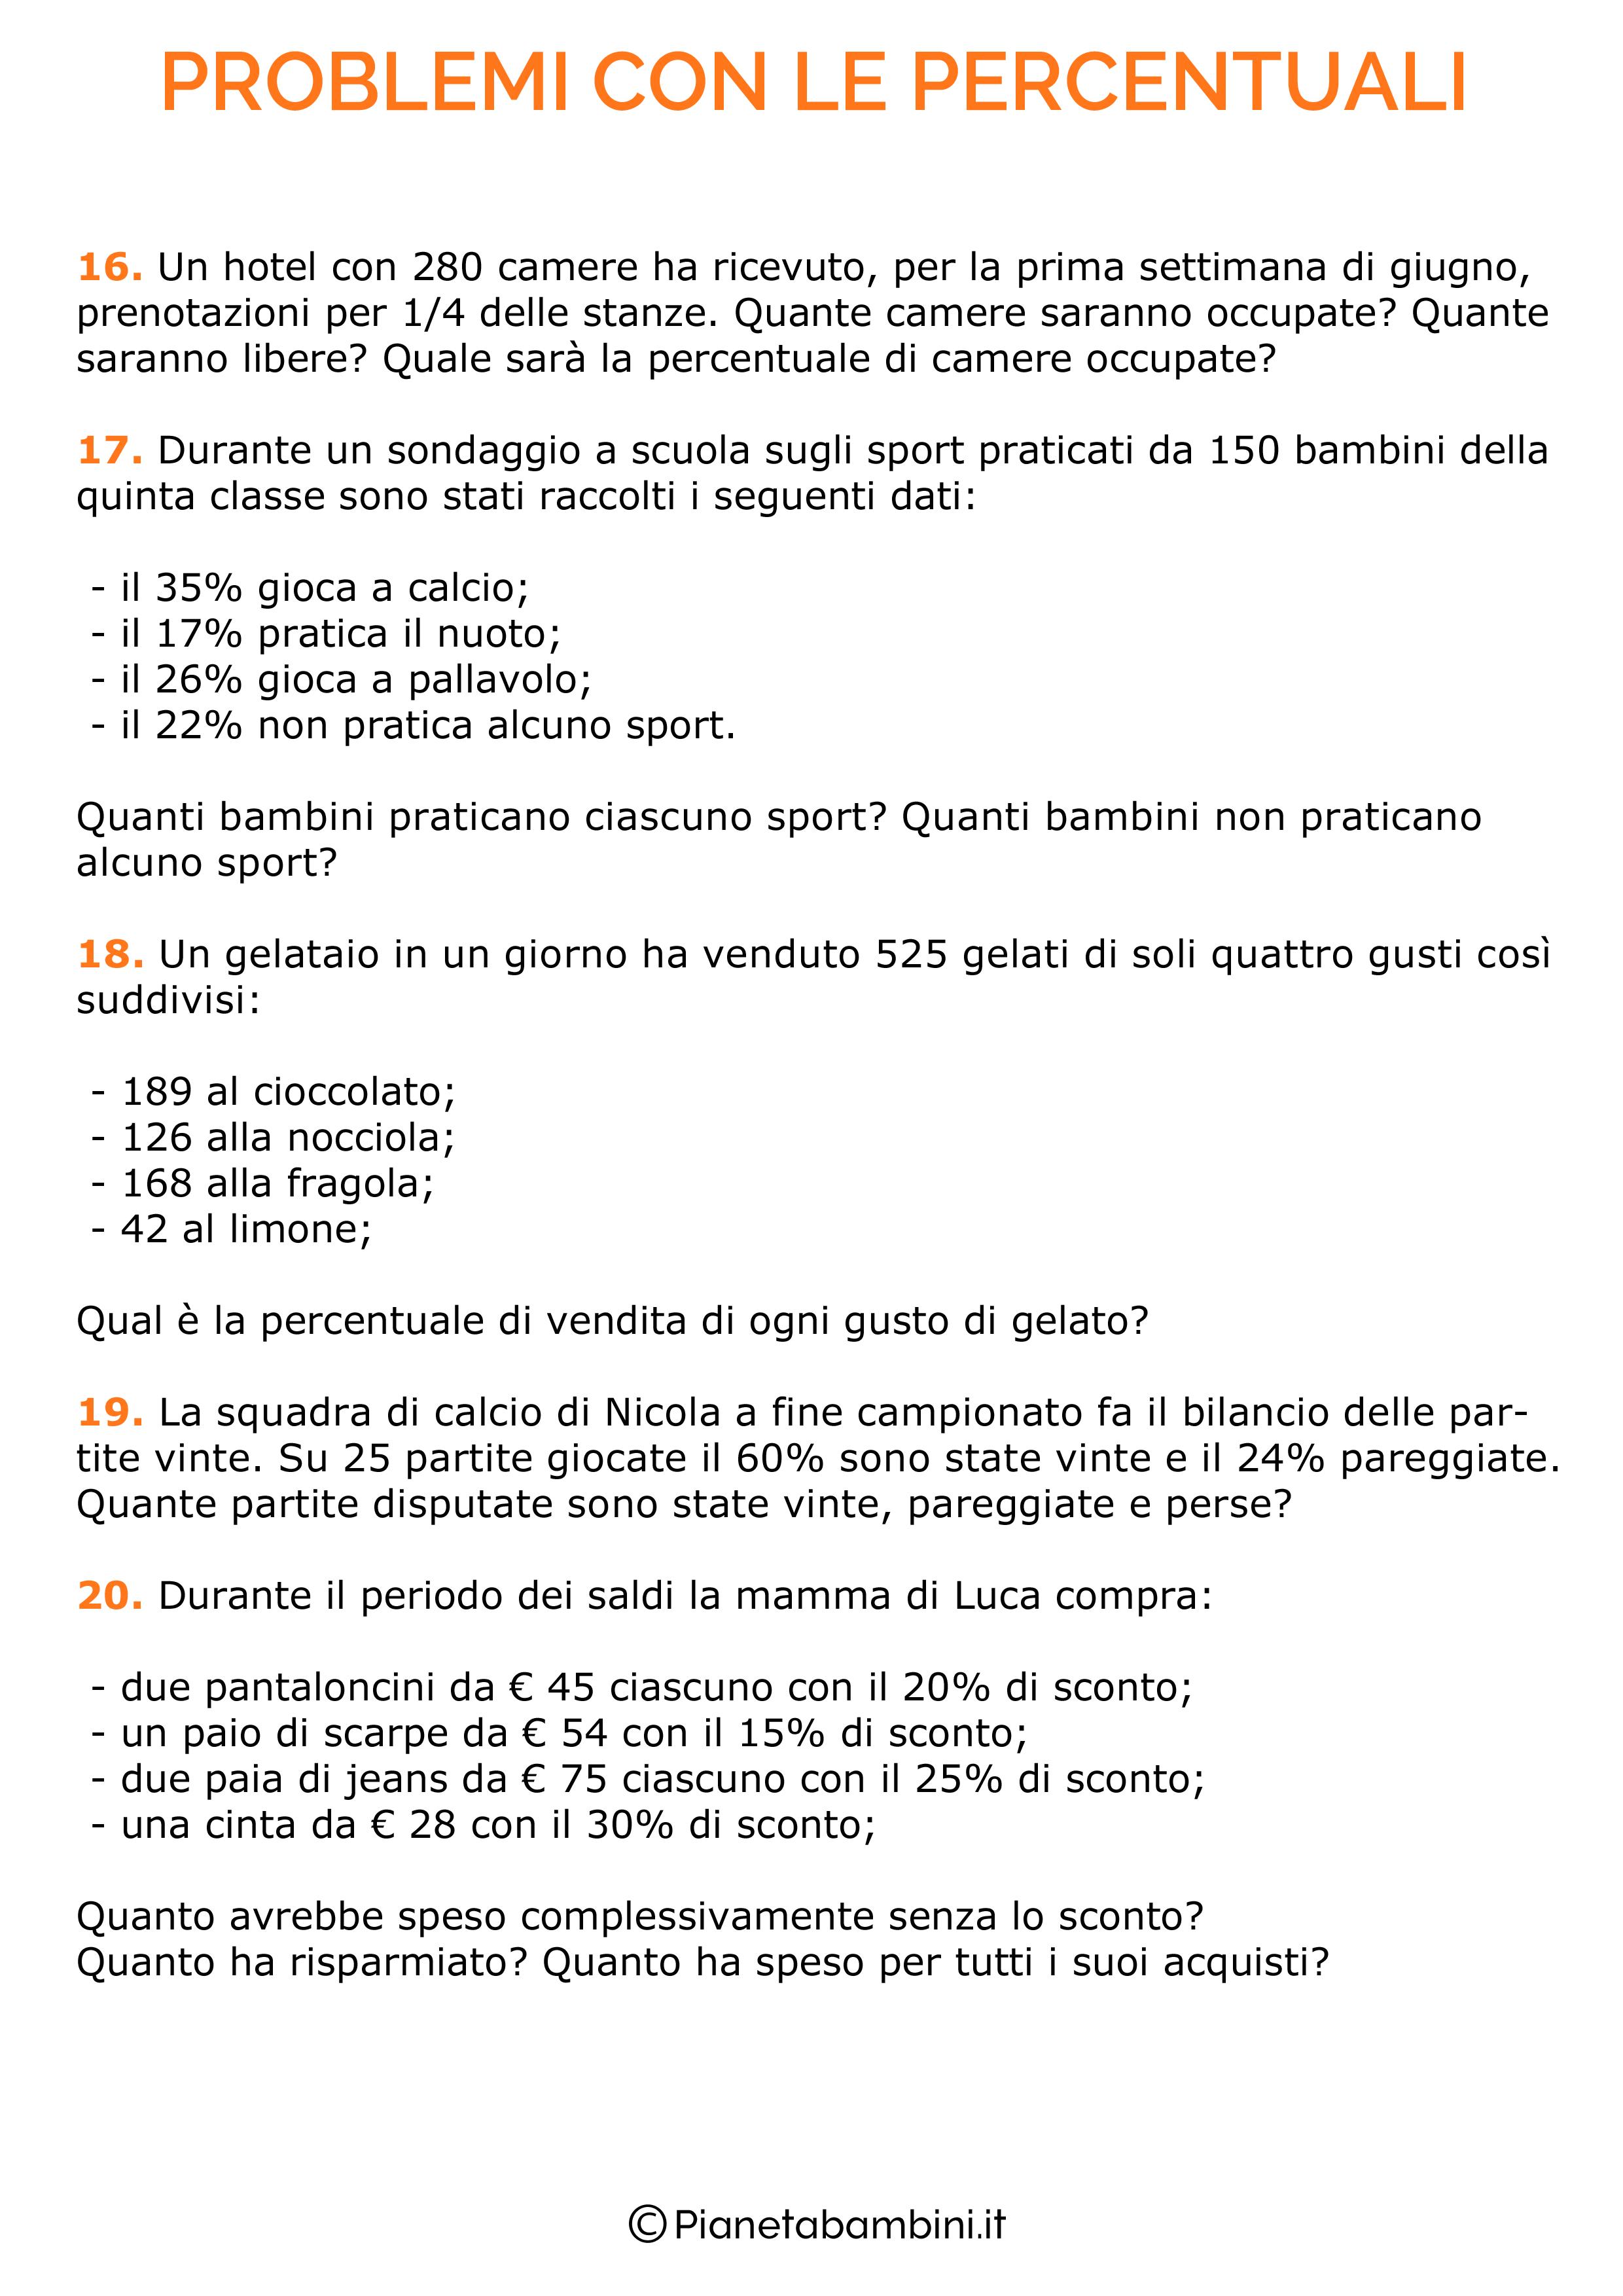 Problemi-Percentuali-3